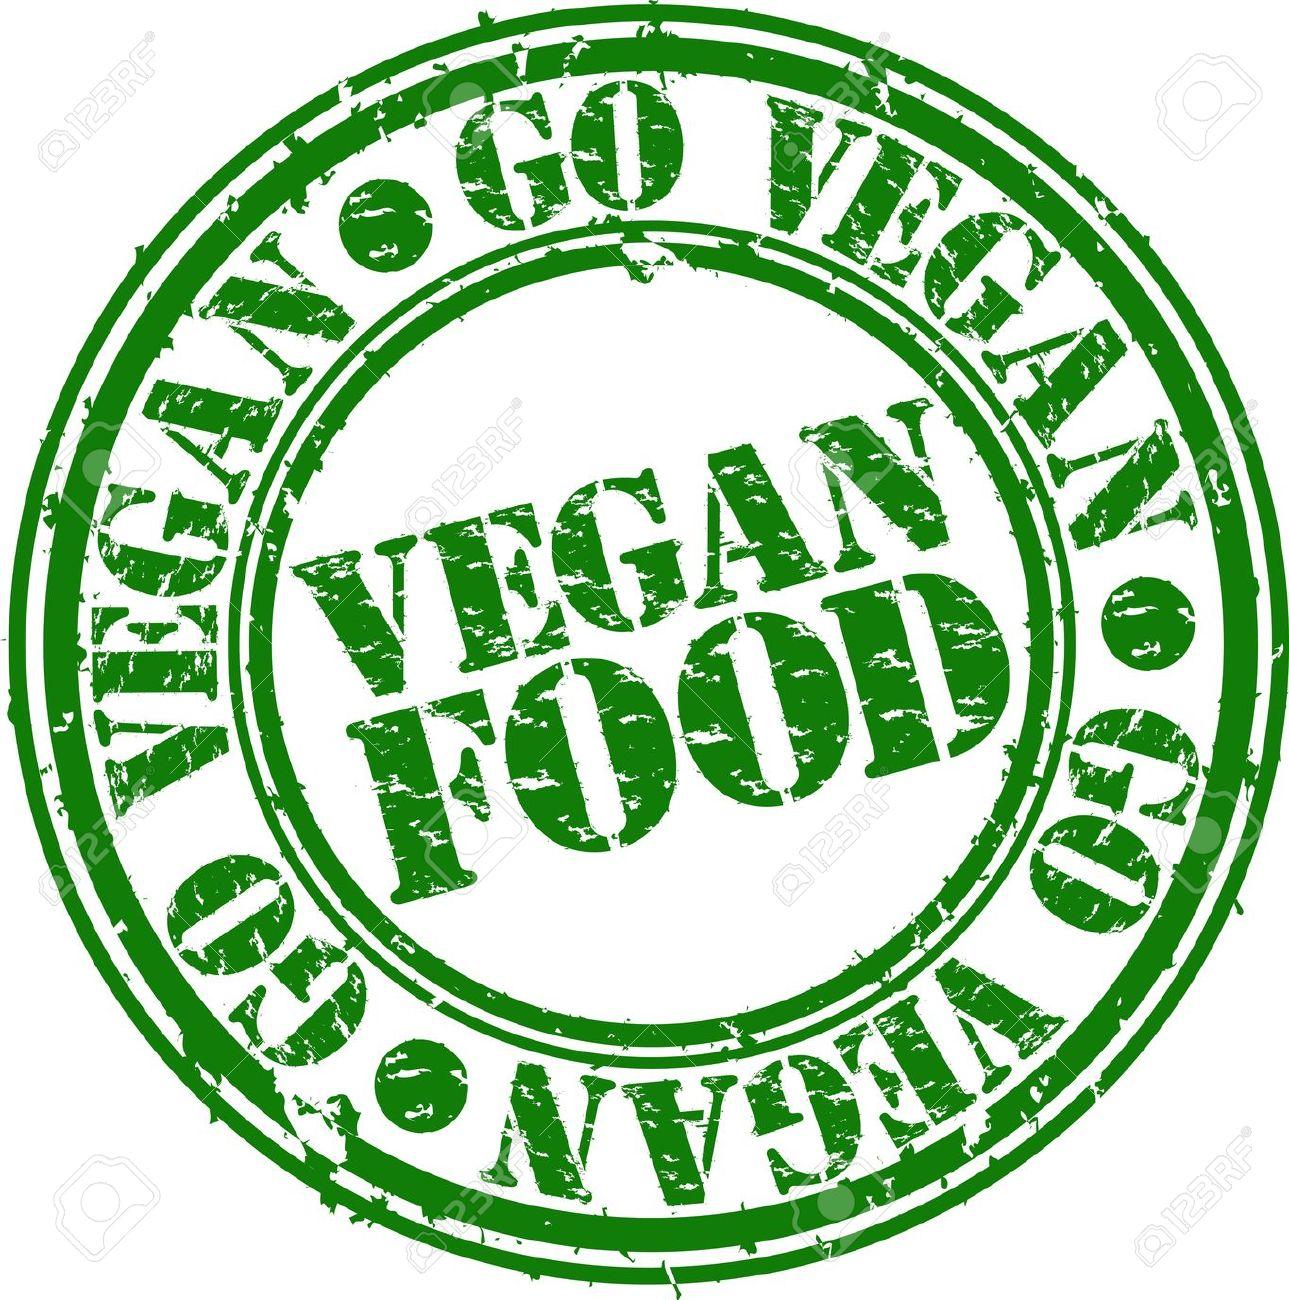 Free vegan images clipart.